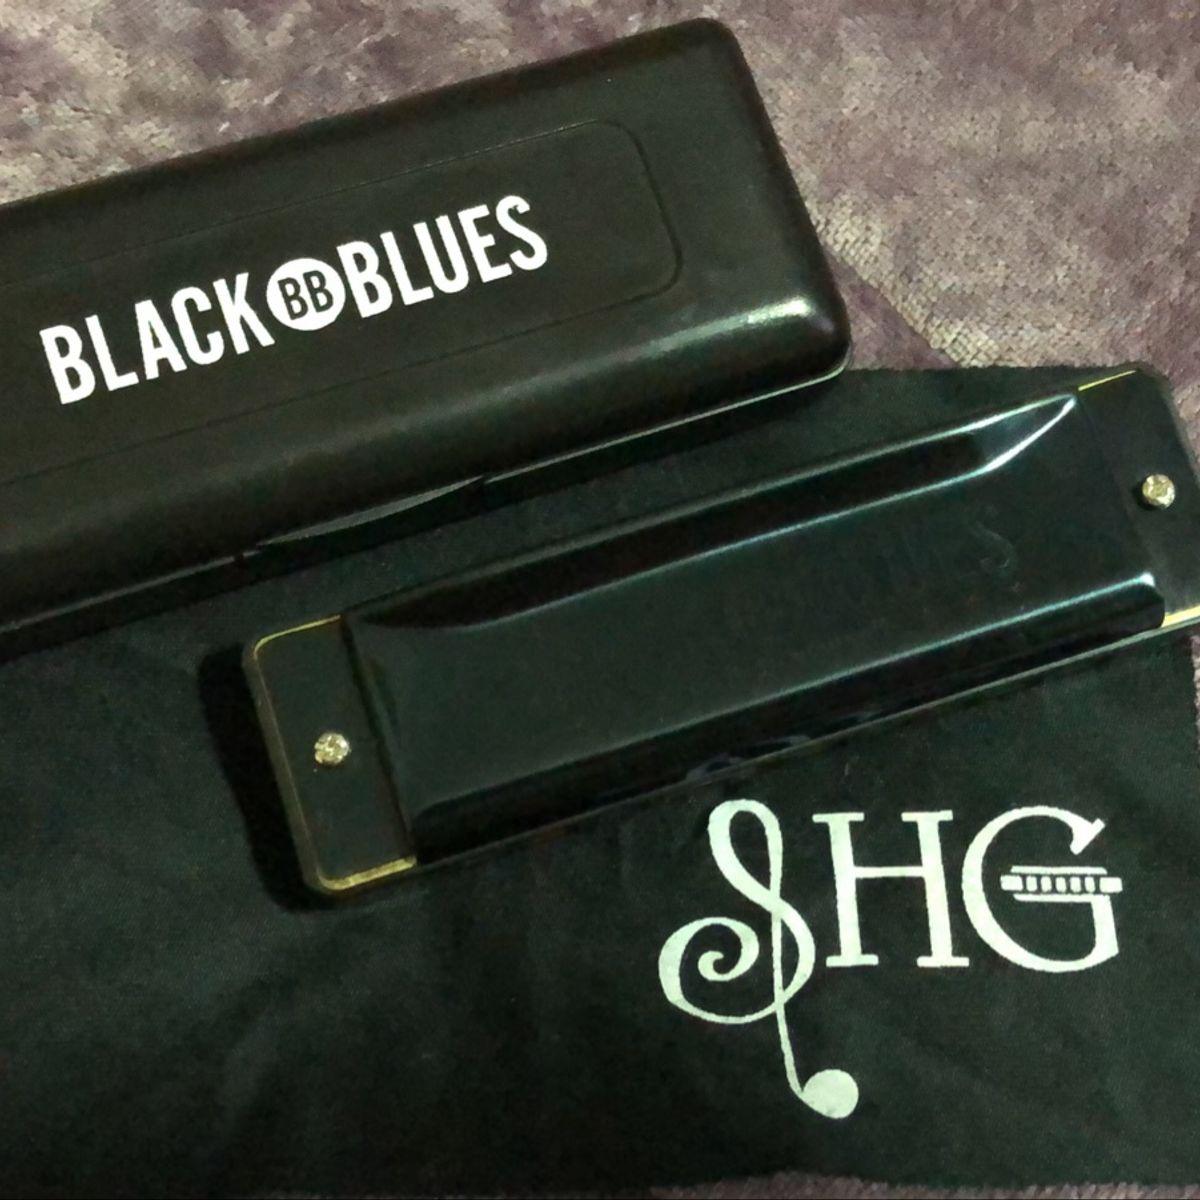 Gaita de Boca Hering Black Blues  Dó (C) 6020C